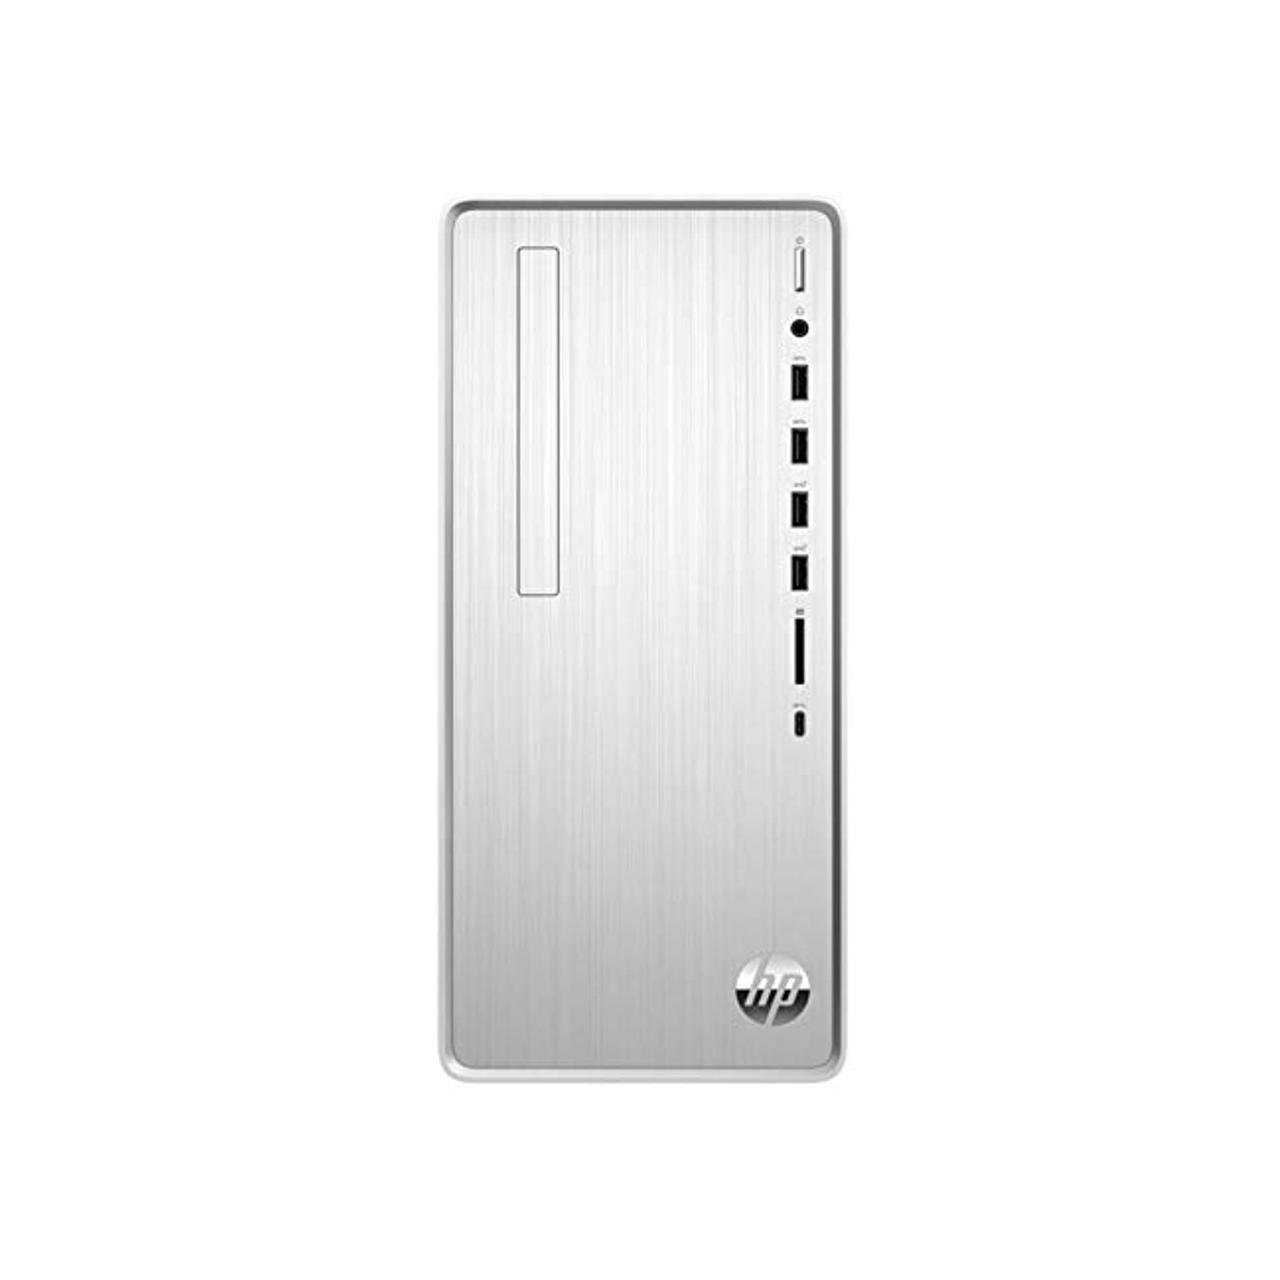 Hp Pavilion TP01 Ryzen 5 3.7 GHz - SSD 256 GB + HDD 1 TB RAM 12GB